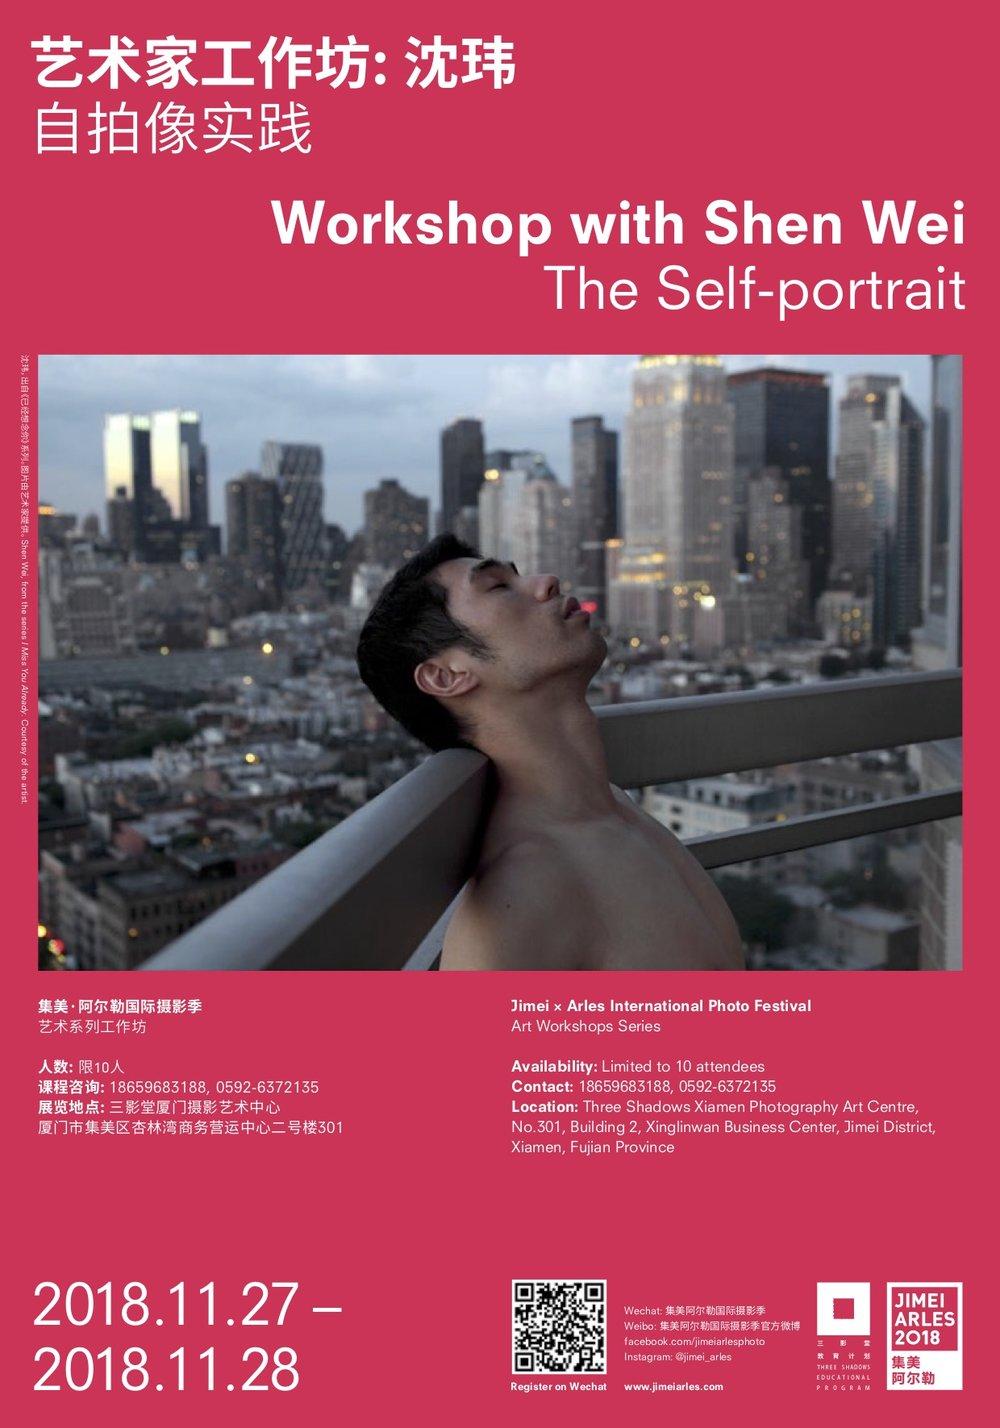 JIMEIARLES_Workshop Poster_Digital_Shen_Wei.jpg